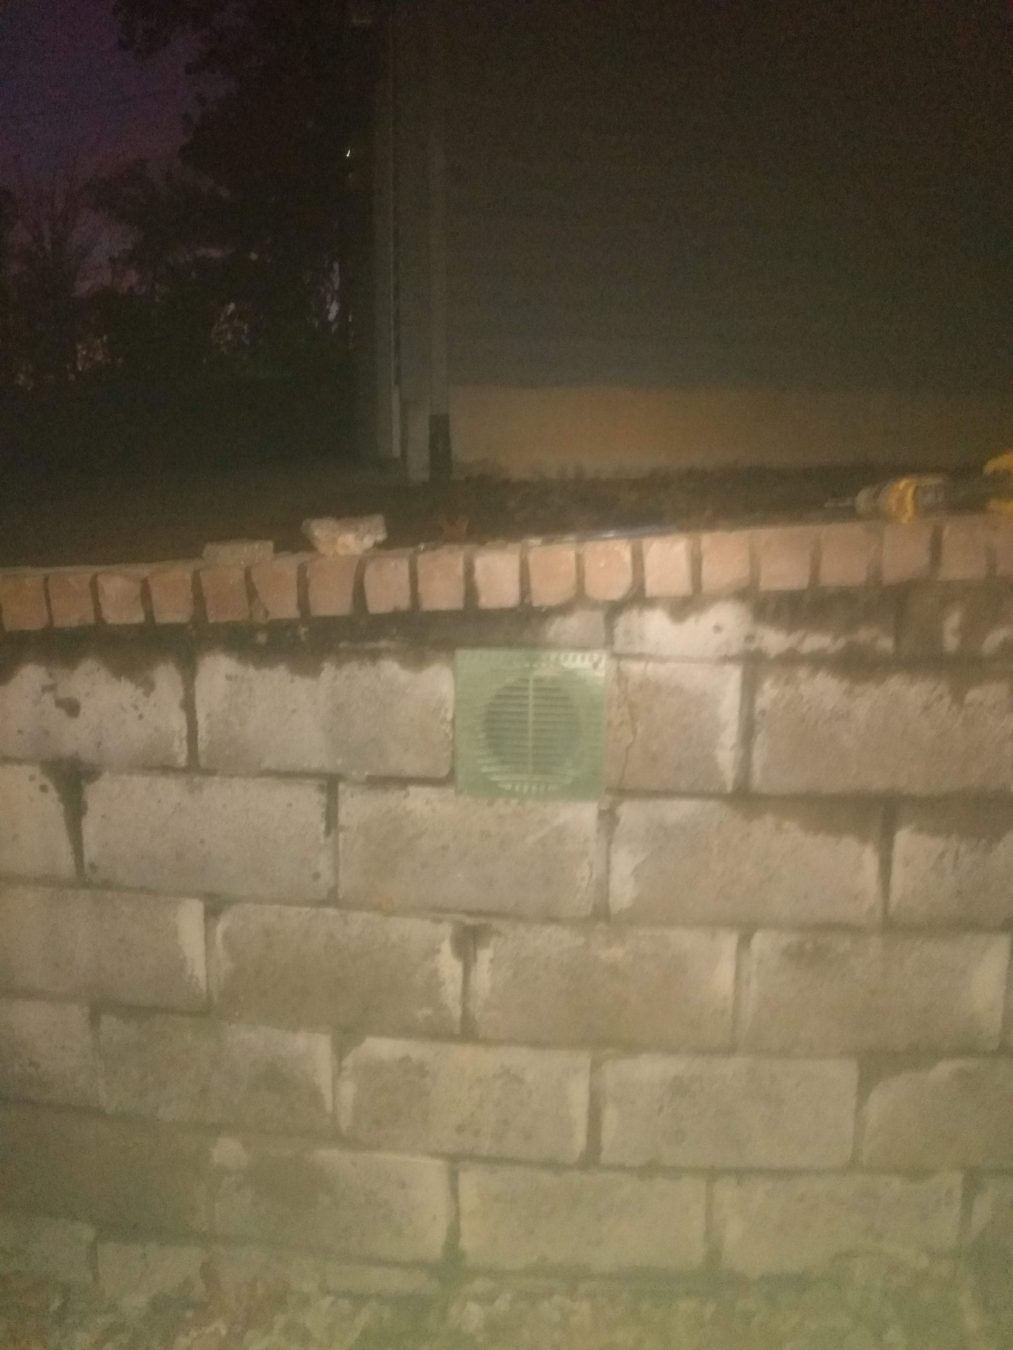 drain in wall